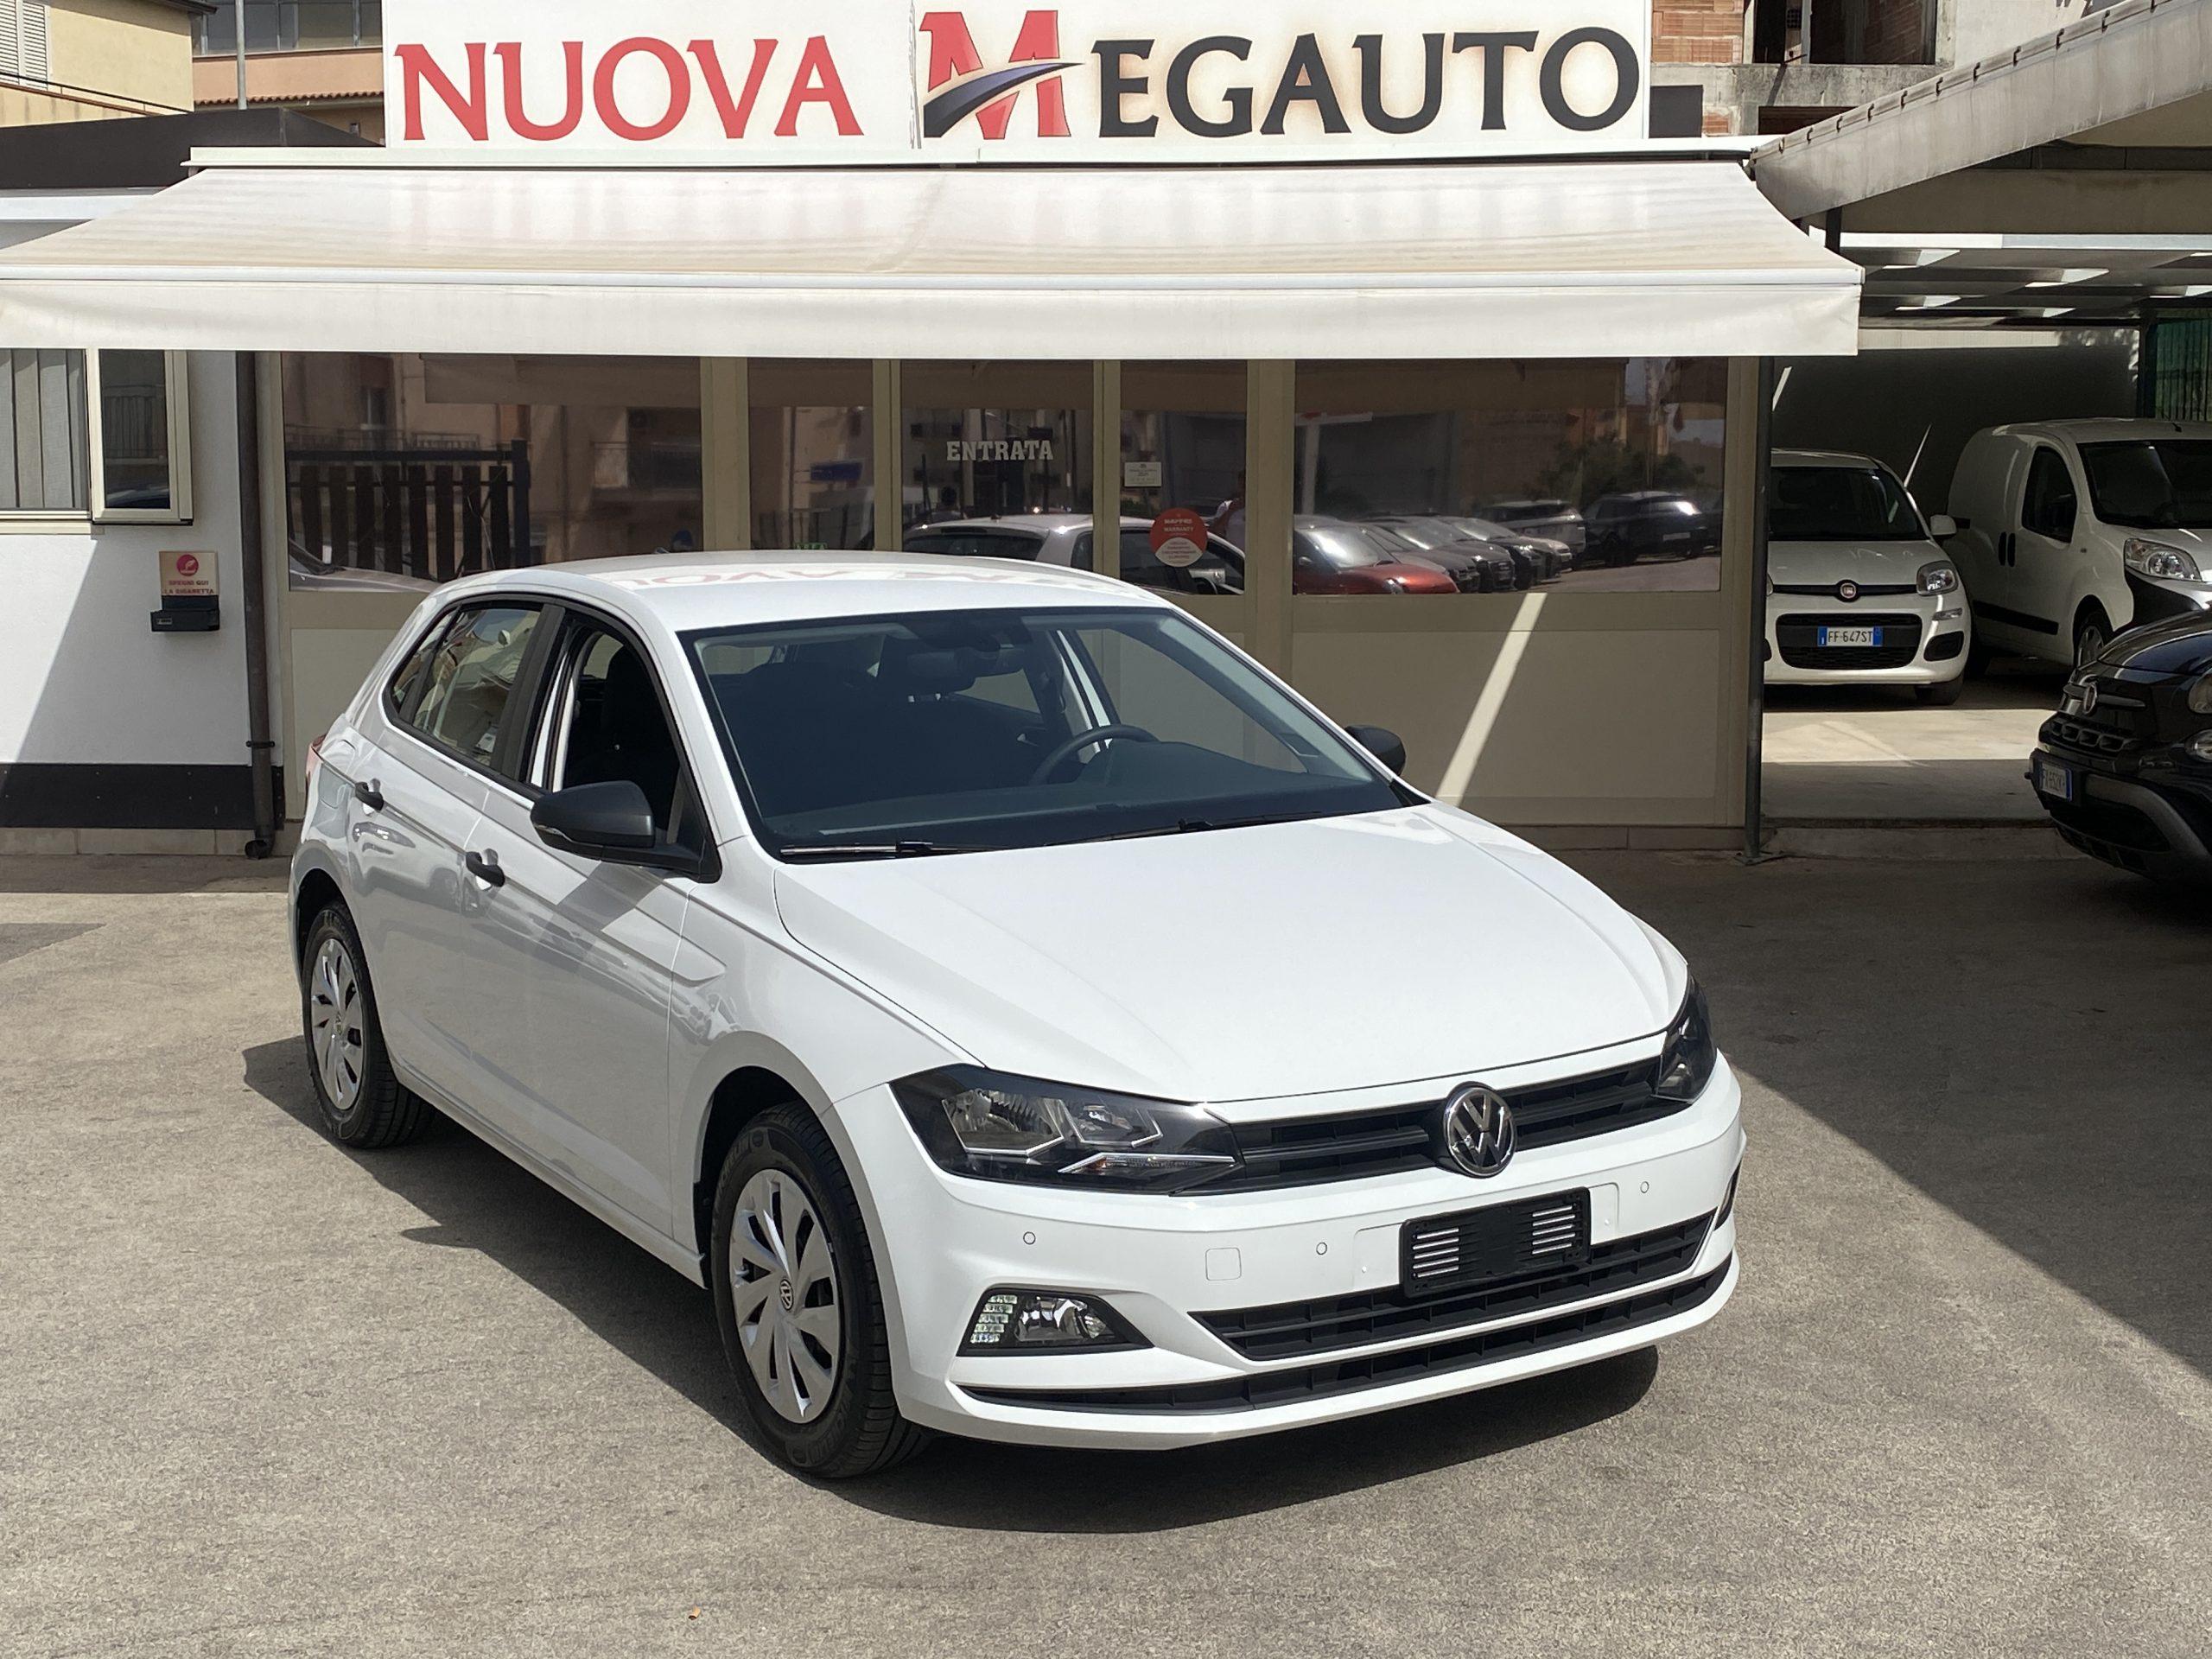 Volkswagen Polo 1.6 TDI 5p. Trendline BlueMotion Technology X NEOPATENTATI